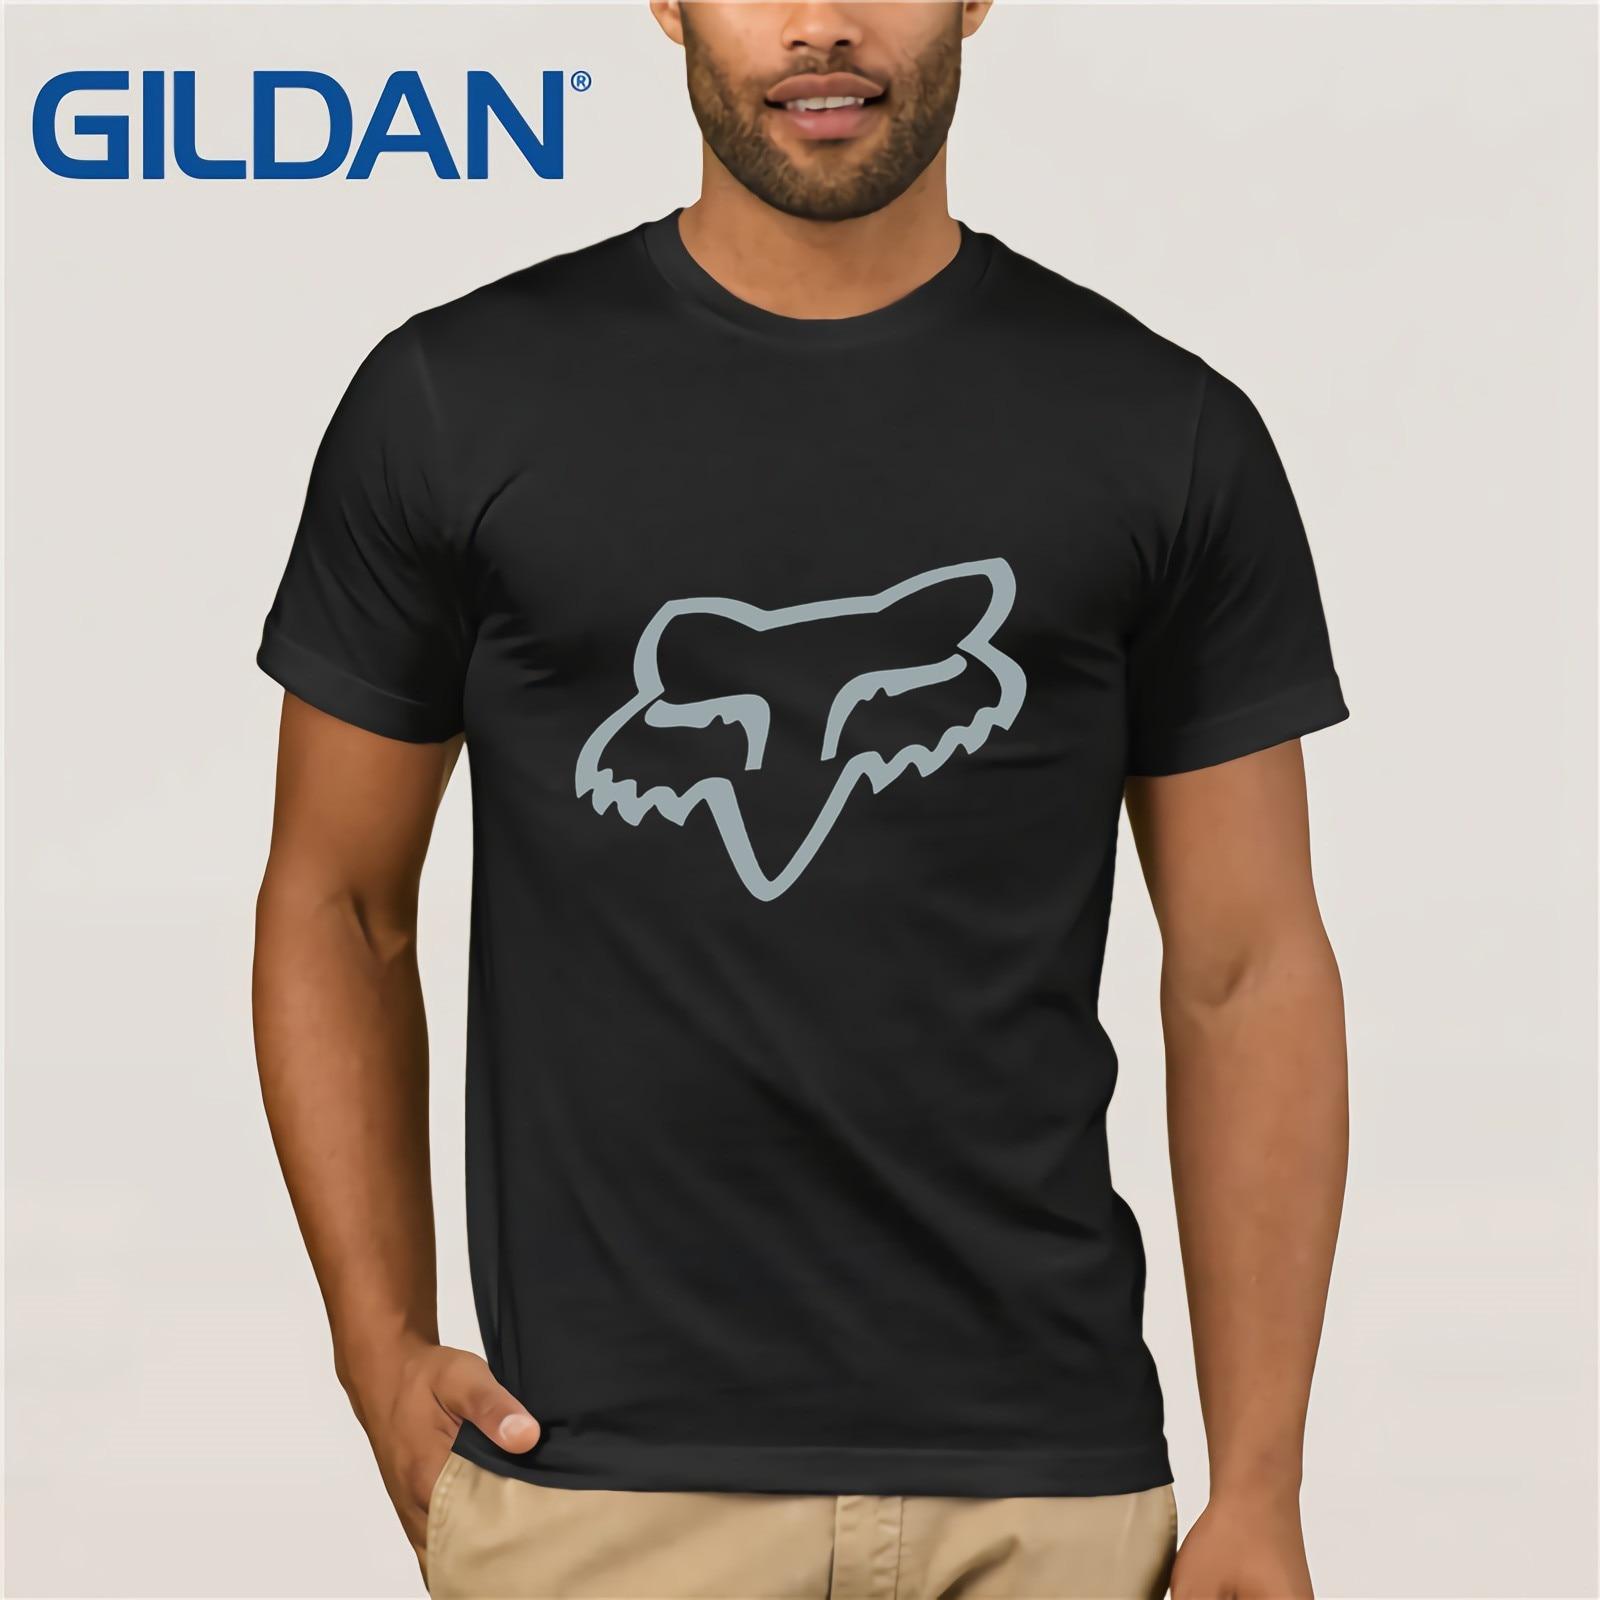 Fox Mtb Ranger Cntr Mens T-shirt - Black All Sizes Mens 2018 Fashion Brand T Shirt O-Neck 100%cotton T-Shirt Tops Tee Custom